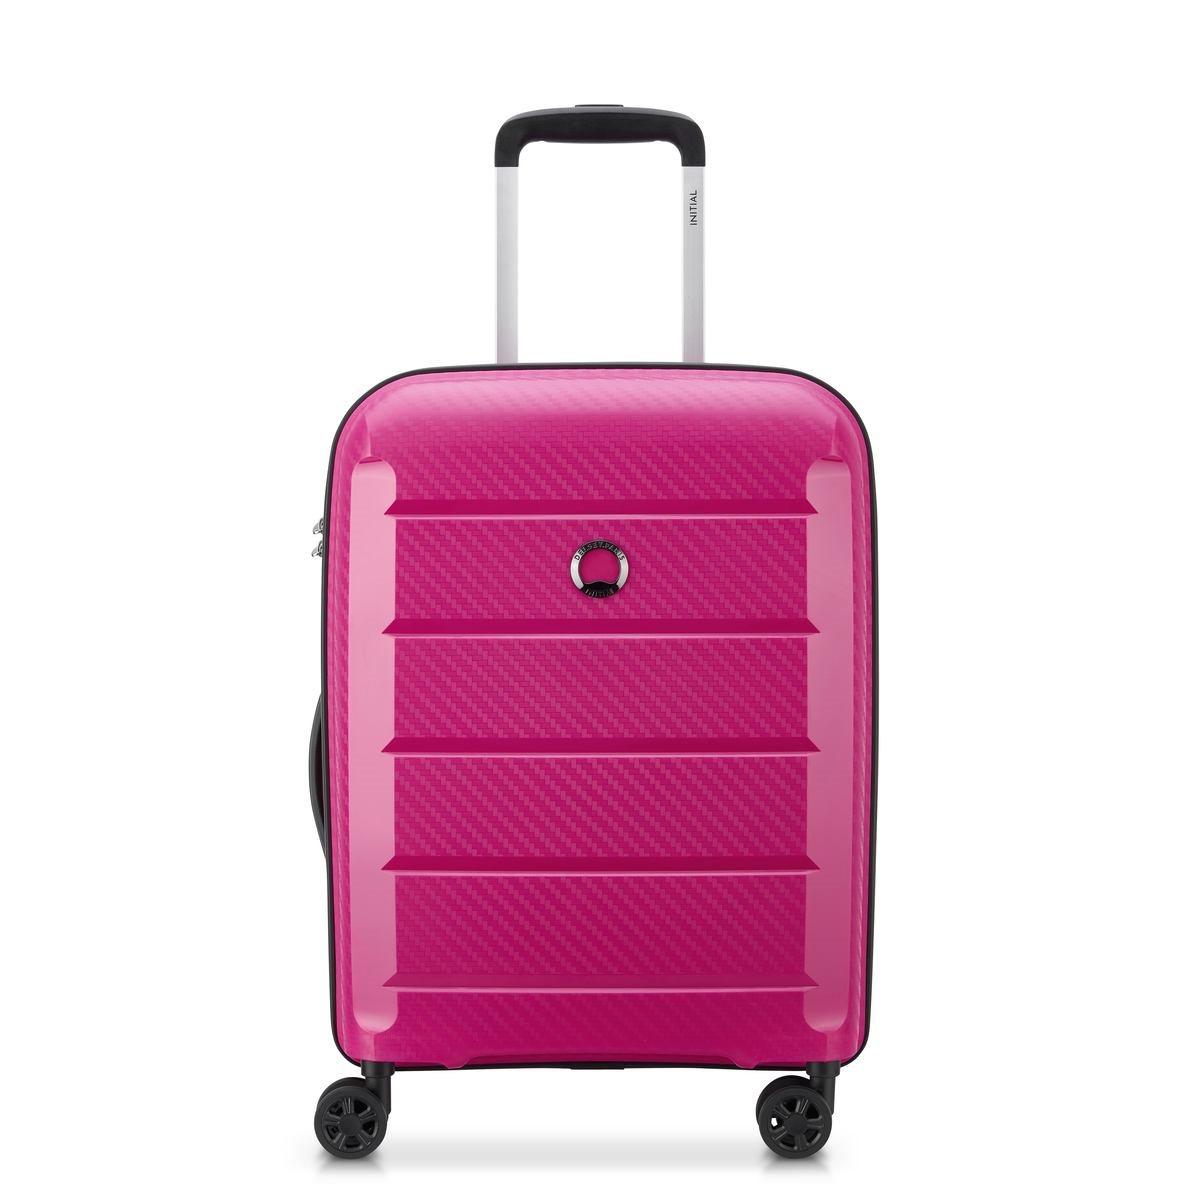 Delsey Βαλίτσα καμπίνας slim 55x40x19cm σειρά Binalog Pink